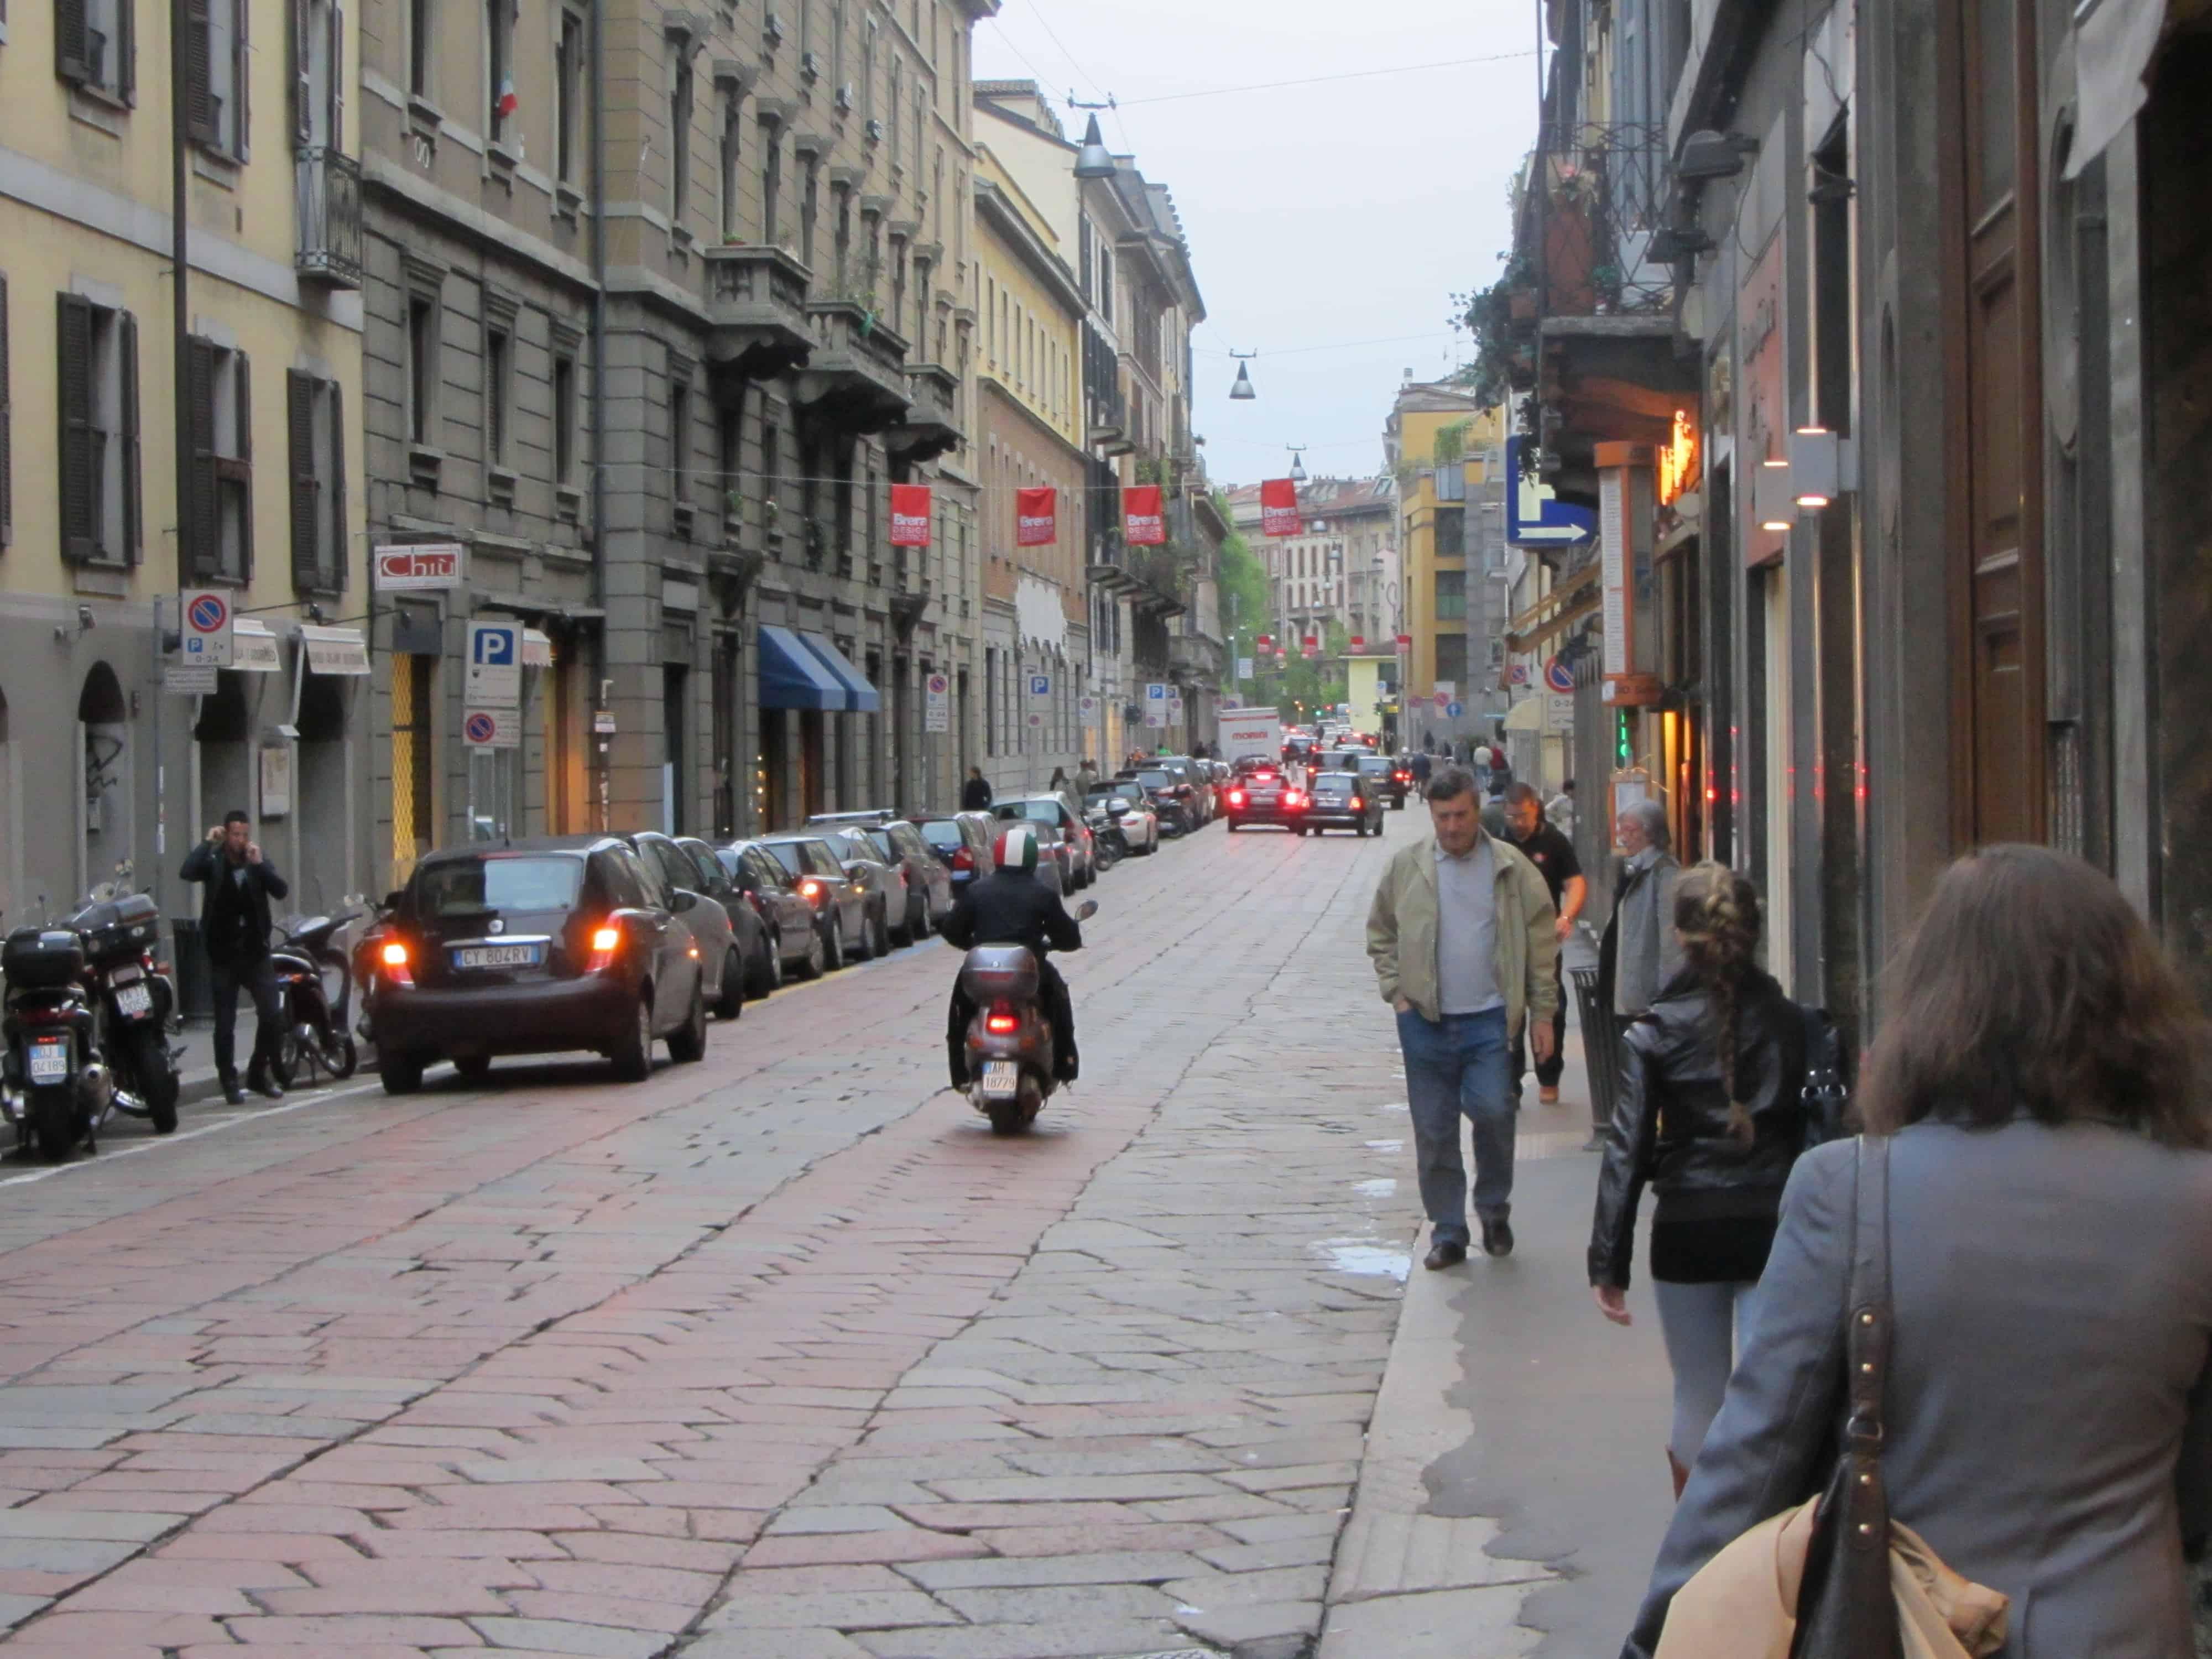 Streets of Quartiere Brera, Milan